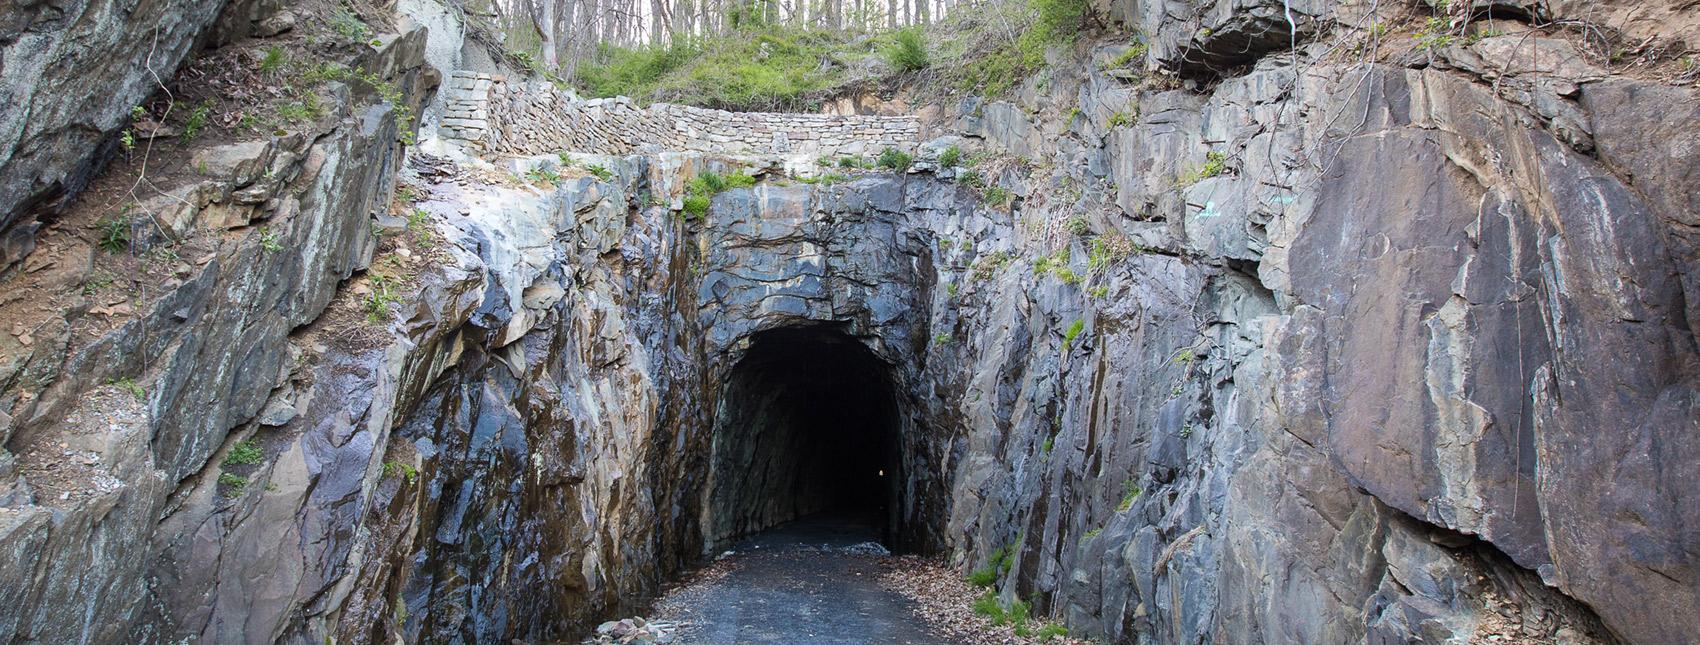 Blue Ridge Tunnel by Jack Looney